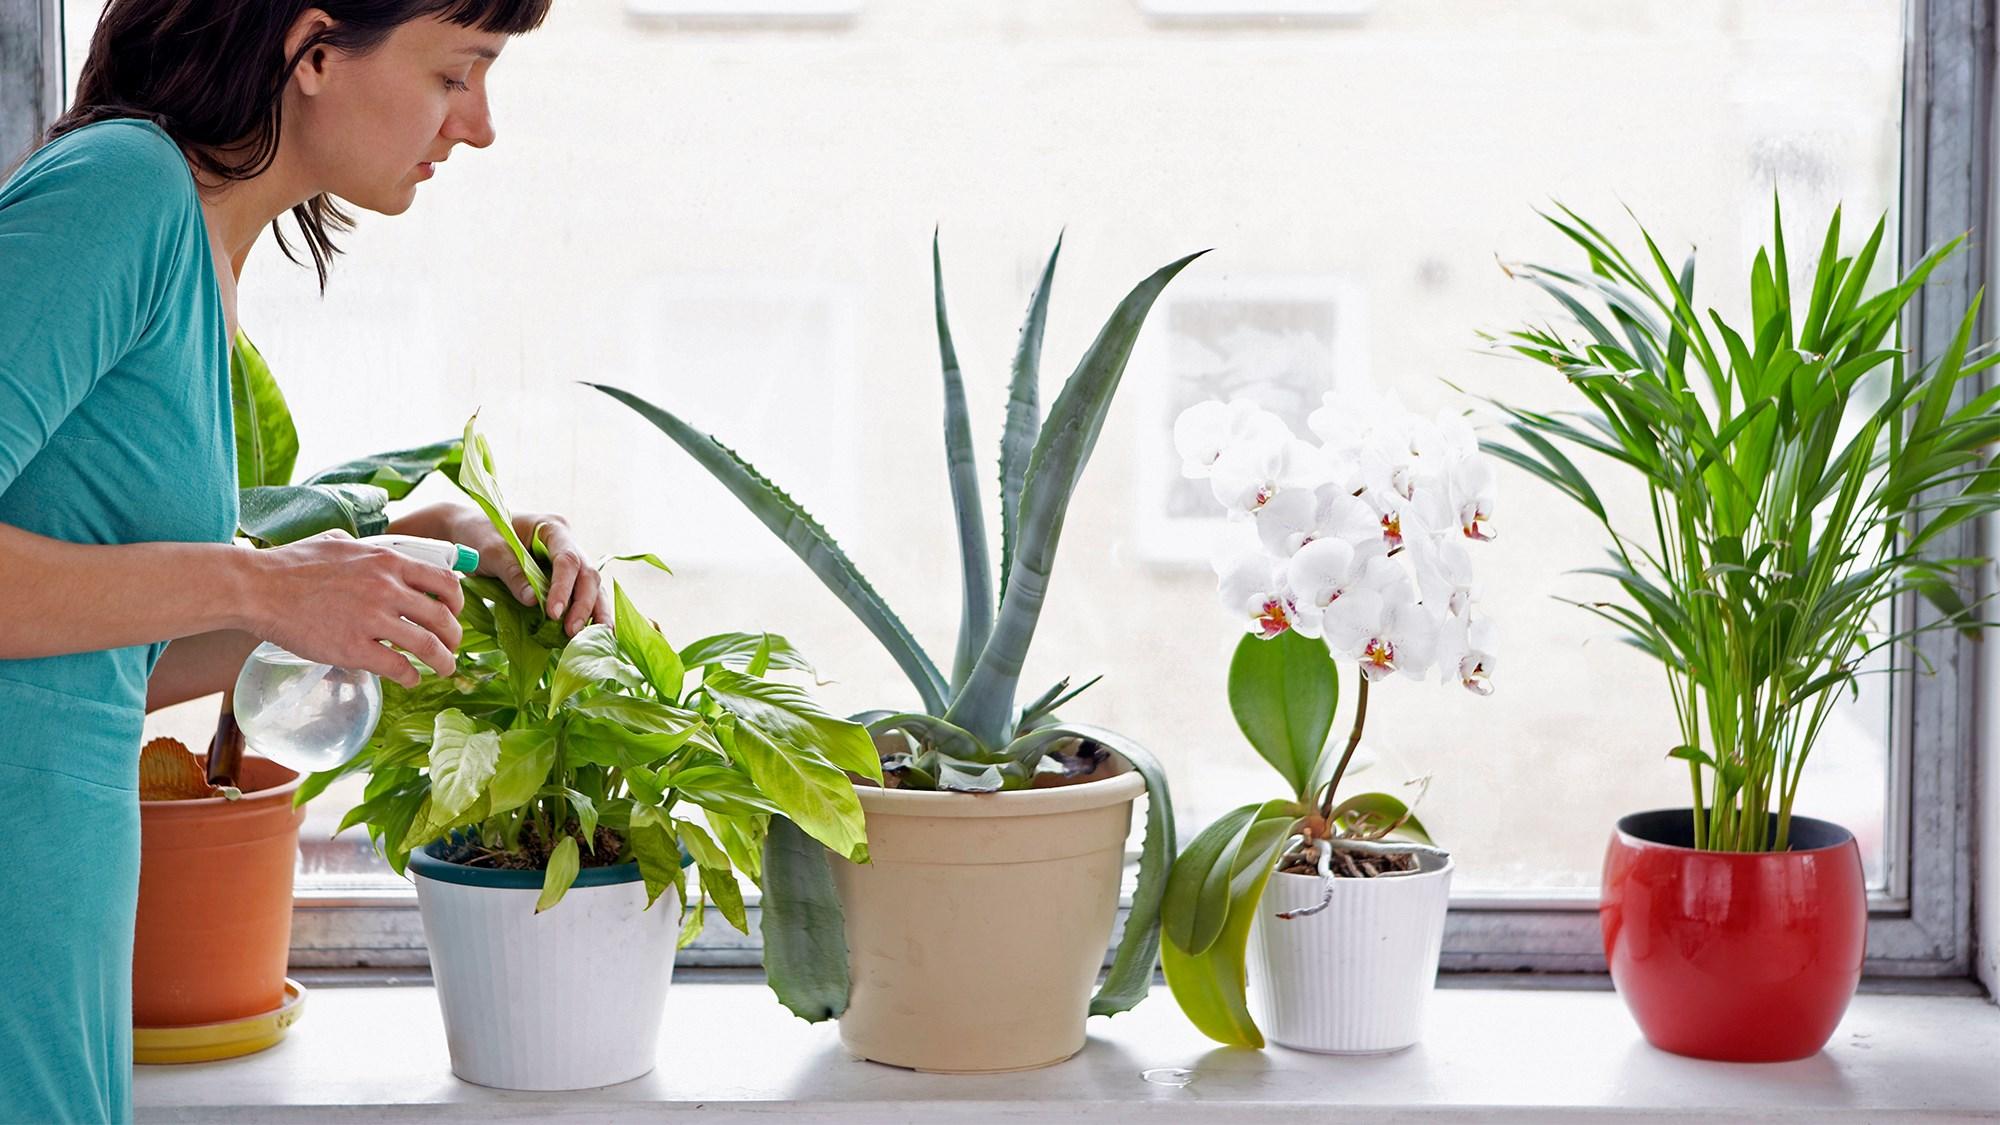 Комнатные цветы - выращивание и уход, каталог комнатных 74